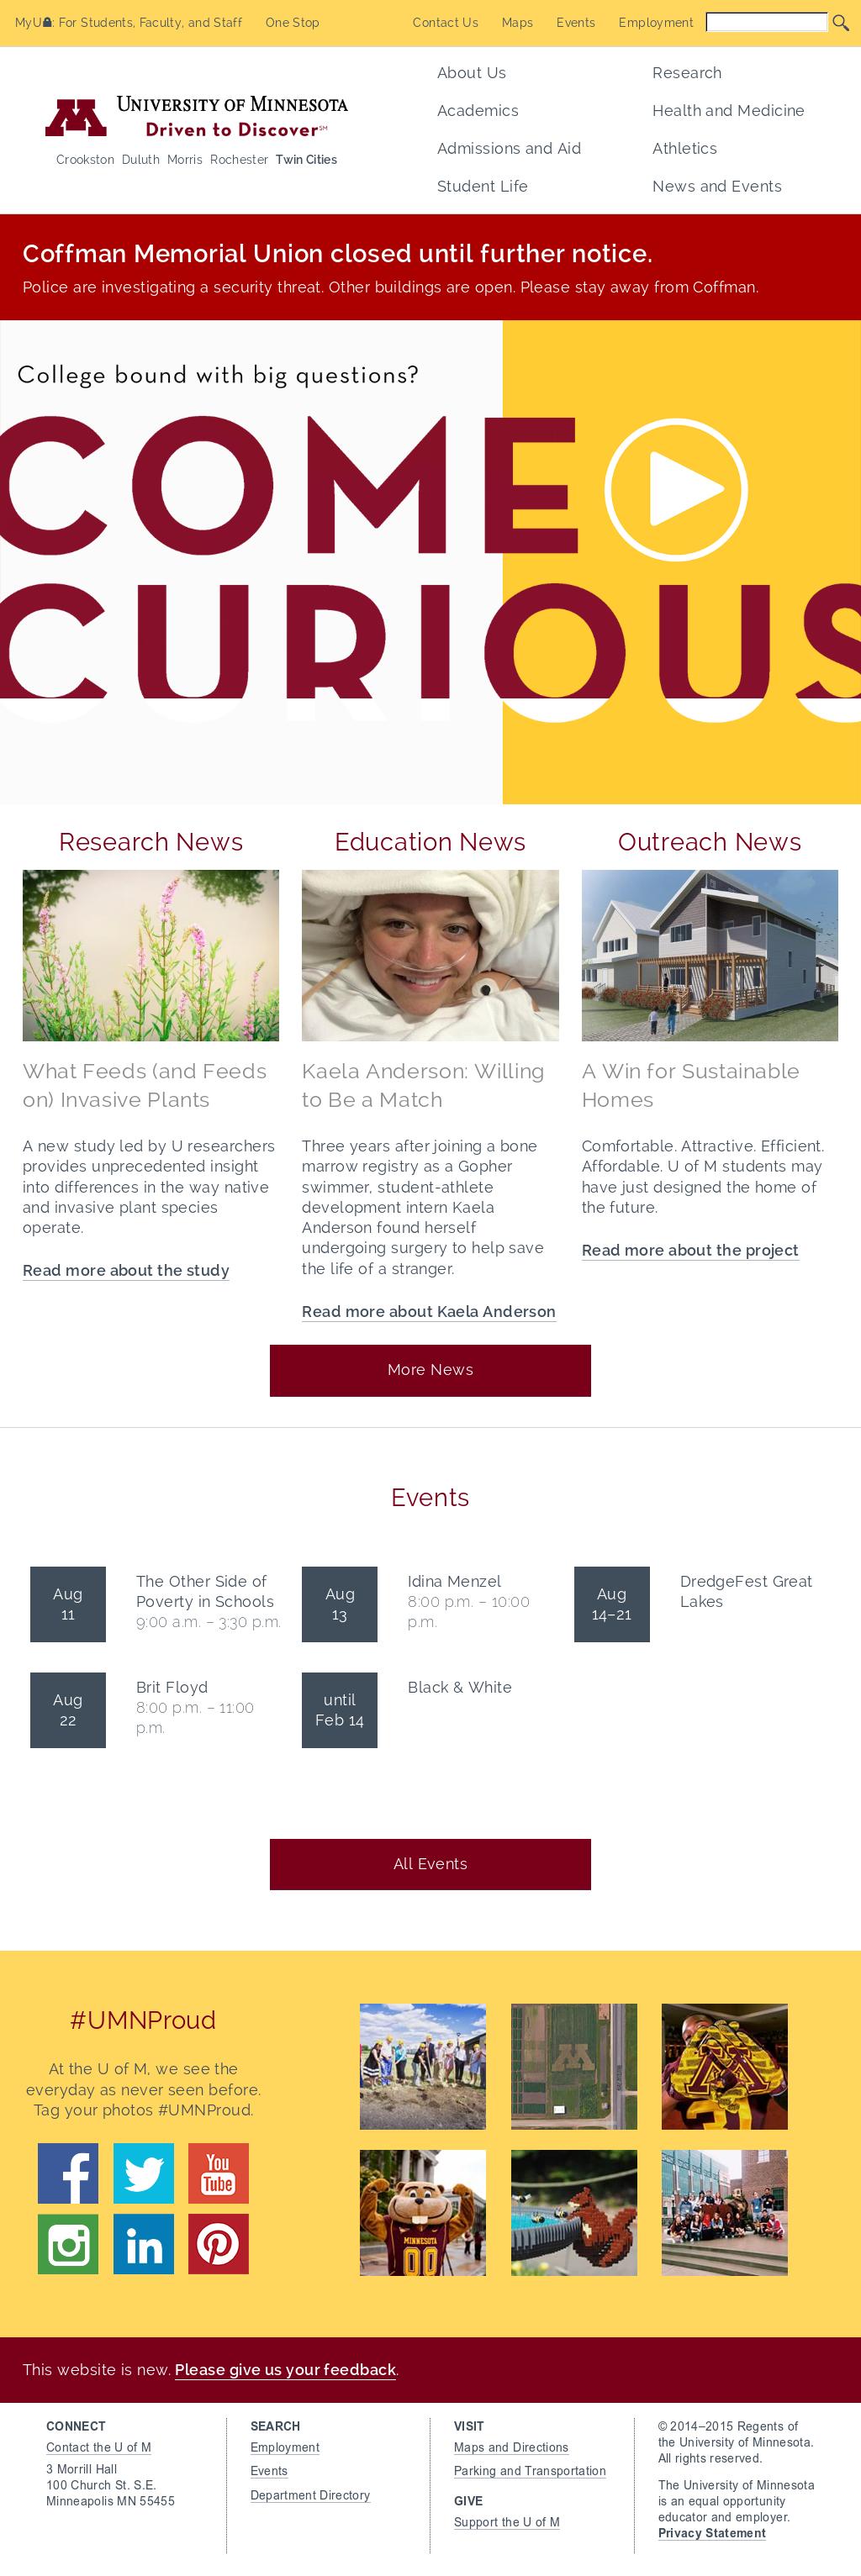 Umn Academic Calendar.University Of Minnesota Competitors Revenue And Employees Owler